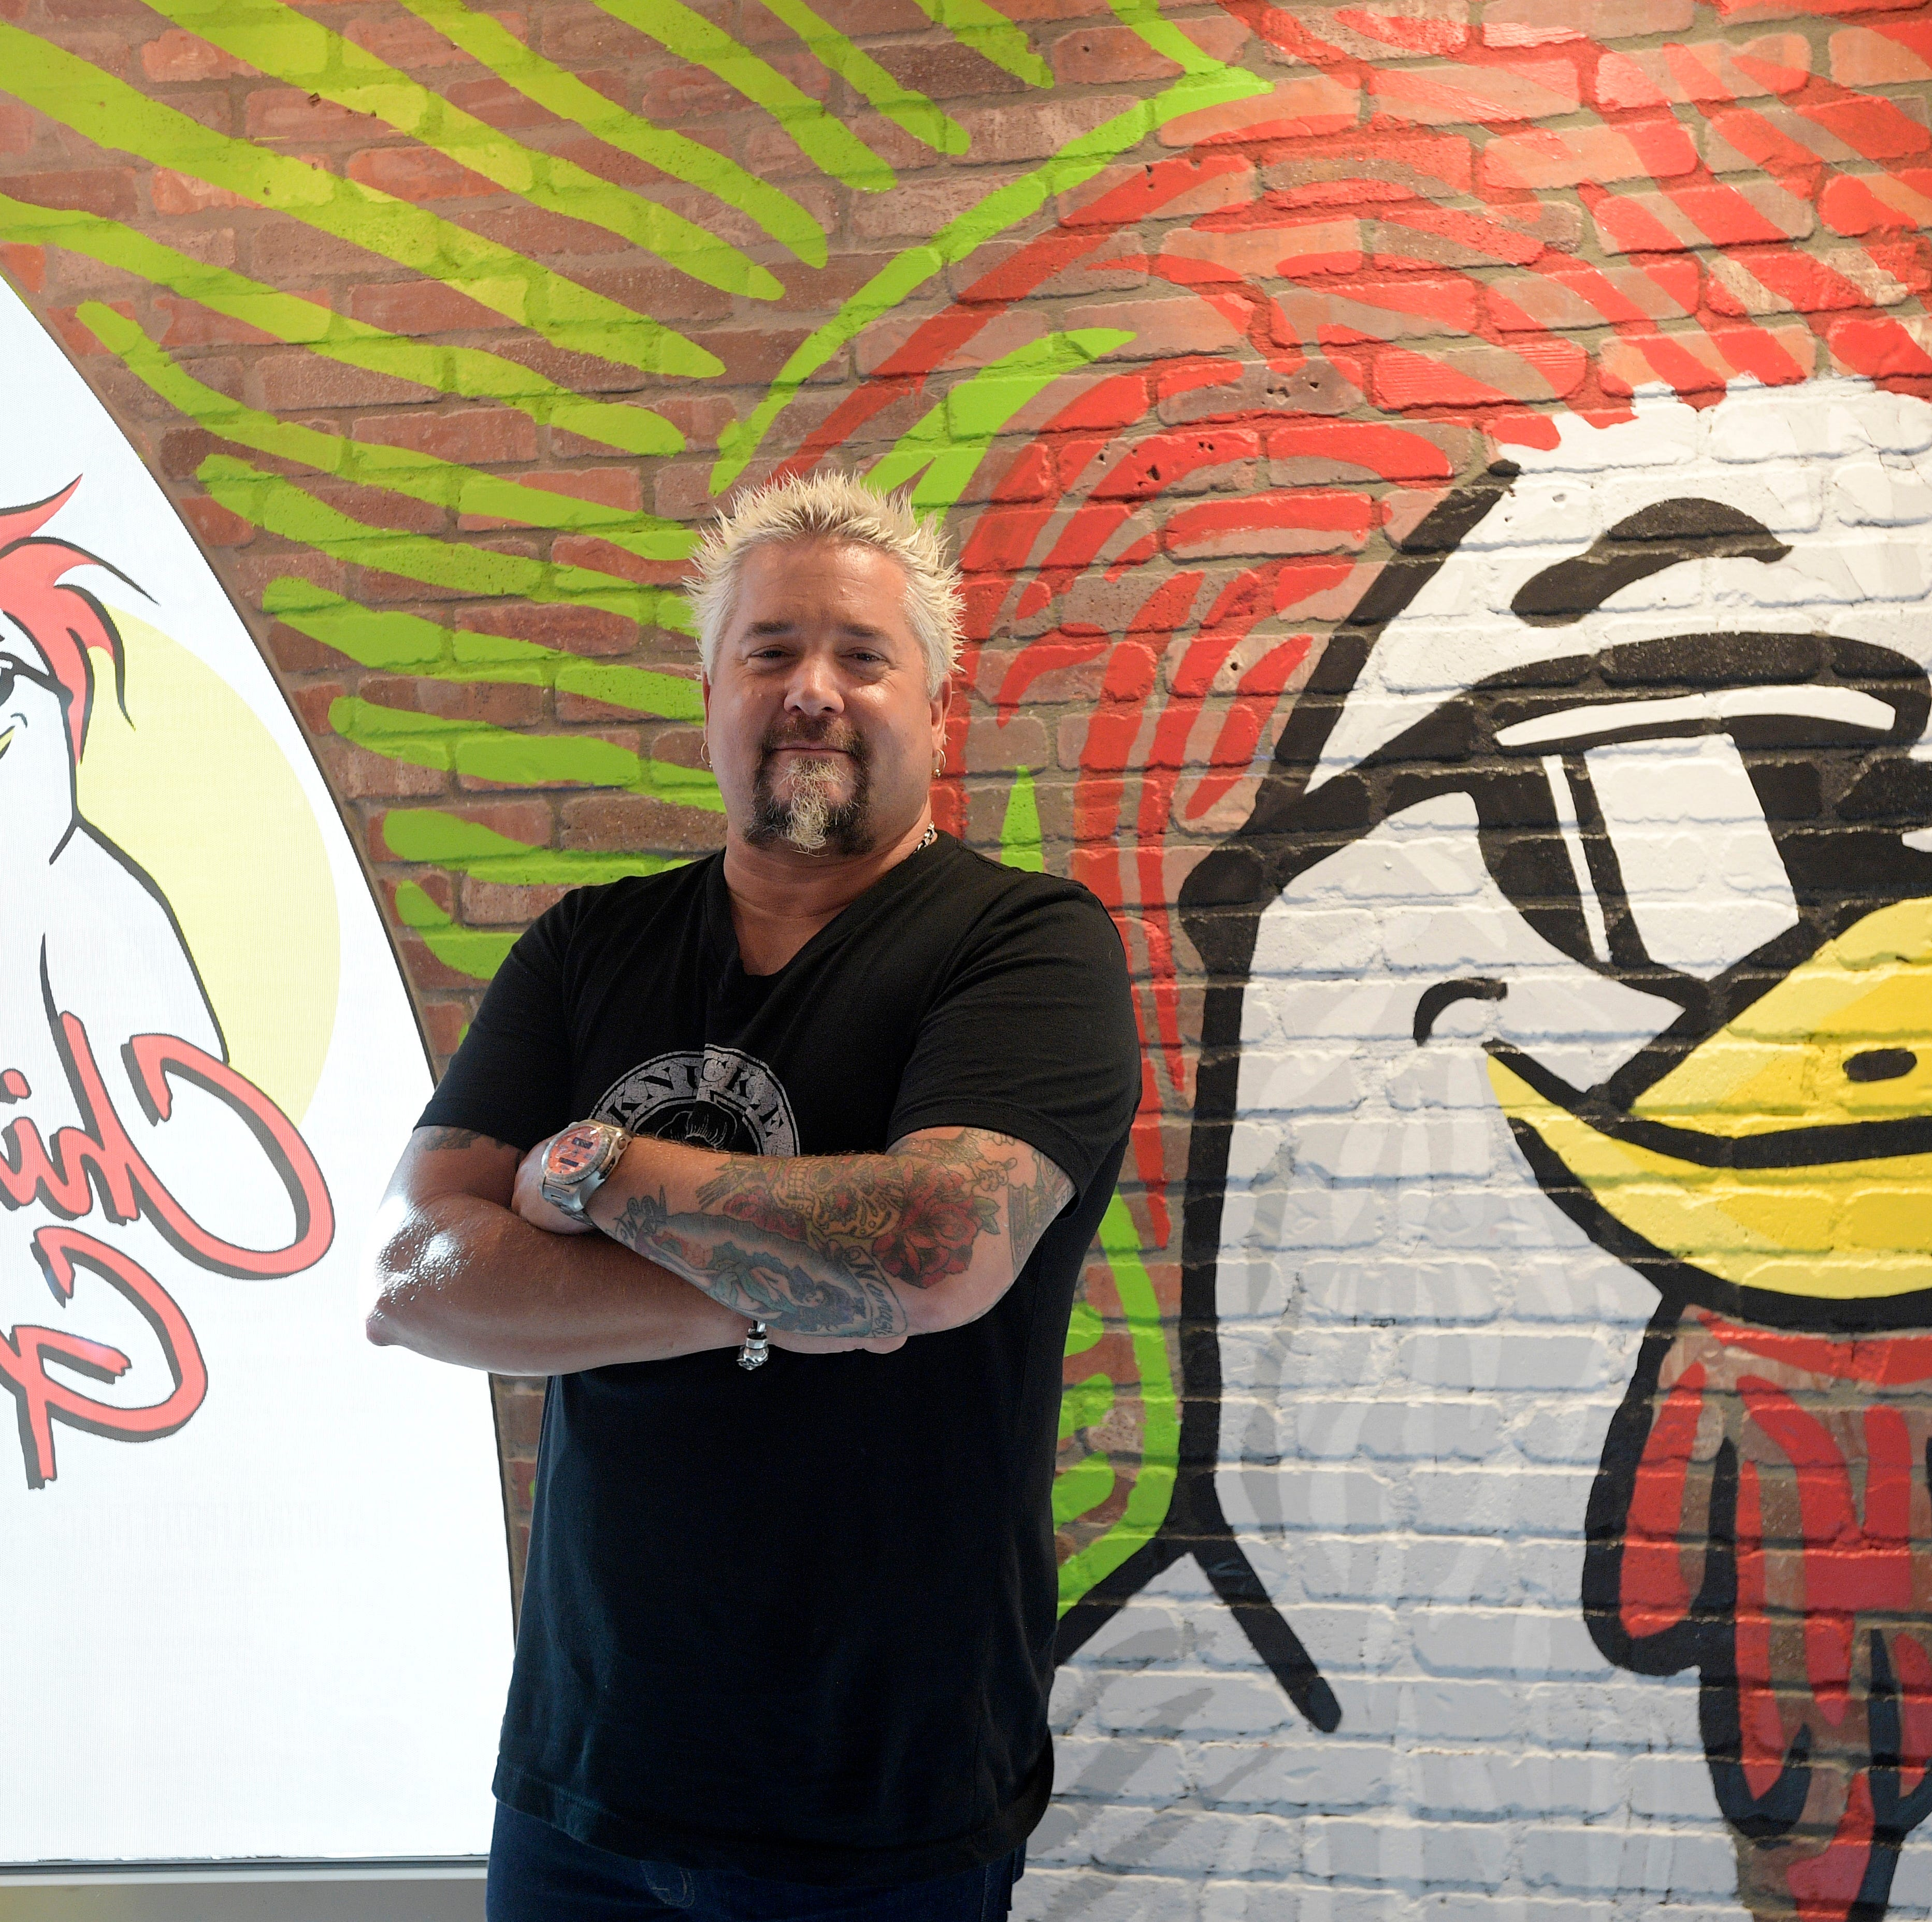 Food Network star Guy Fieri opens Chicken Guy! restaurant at Disney Springs in Orlando